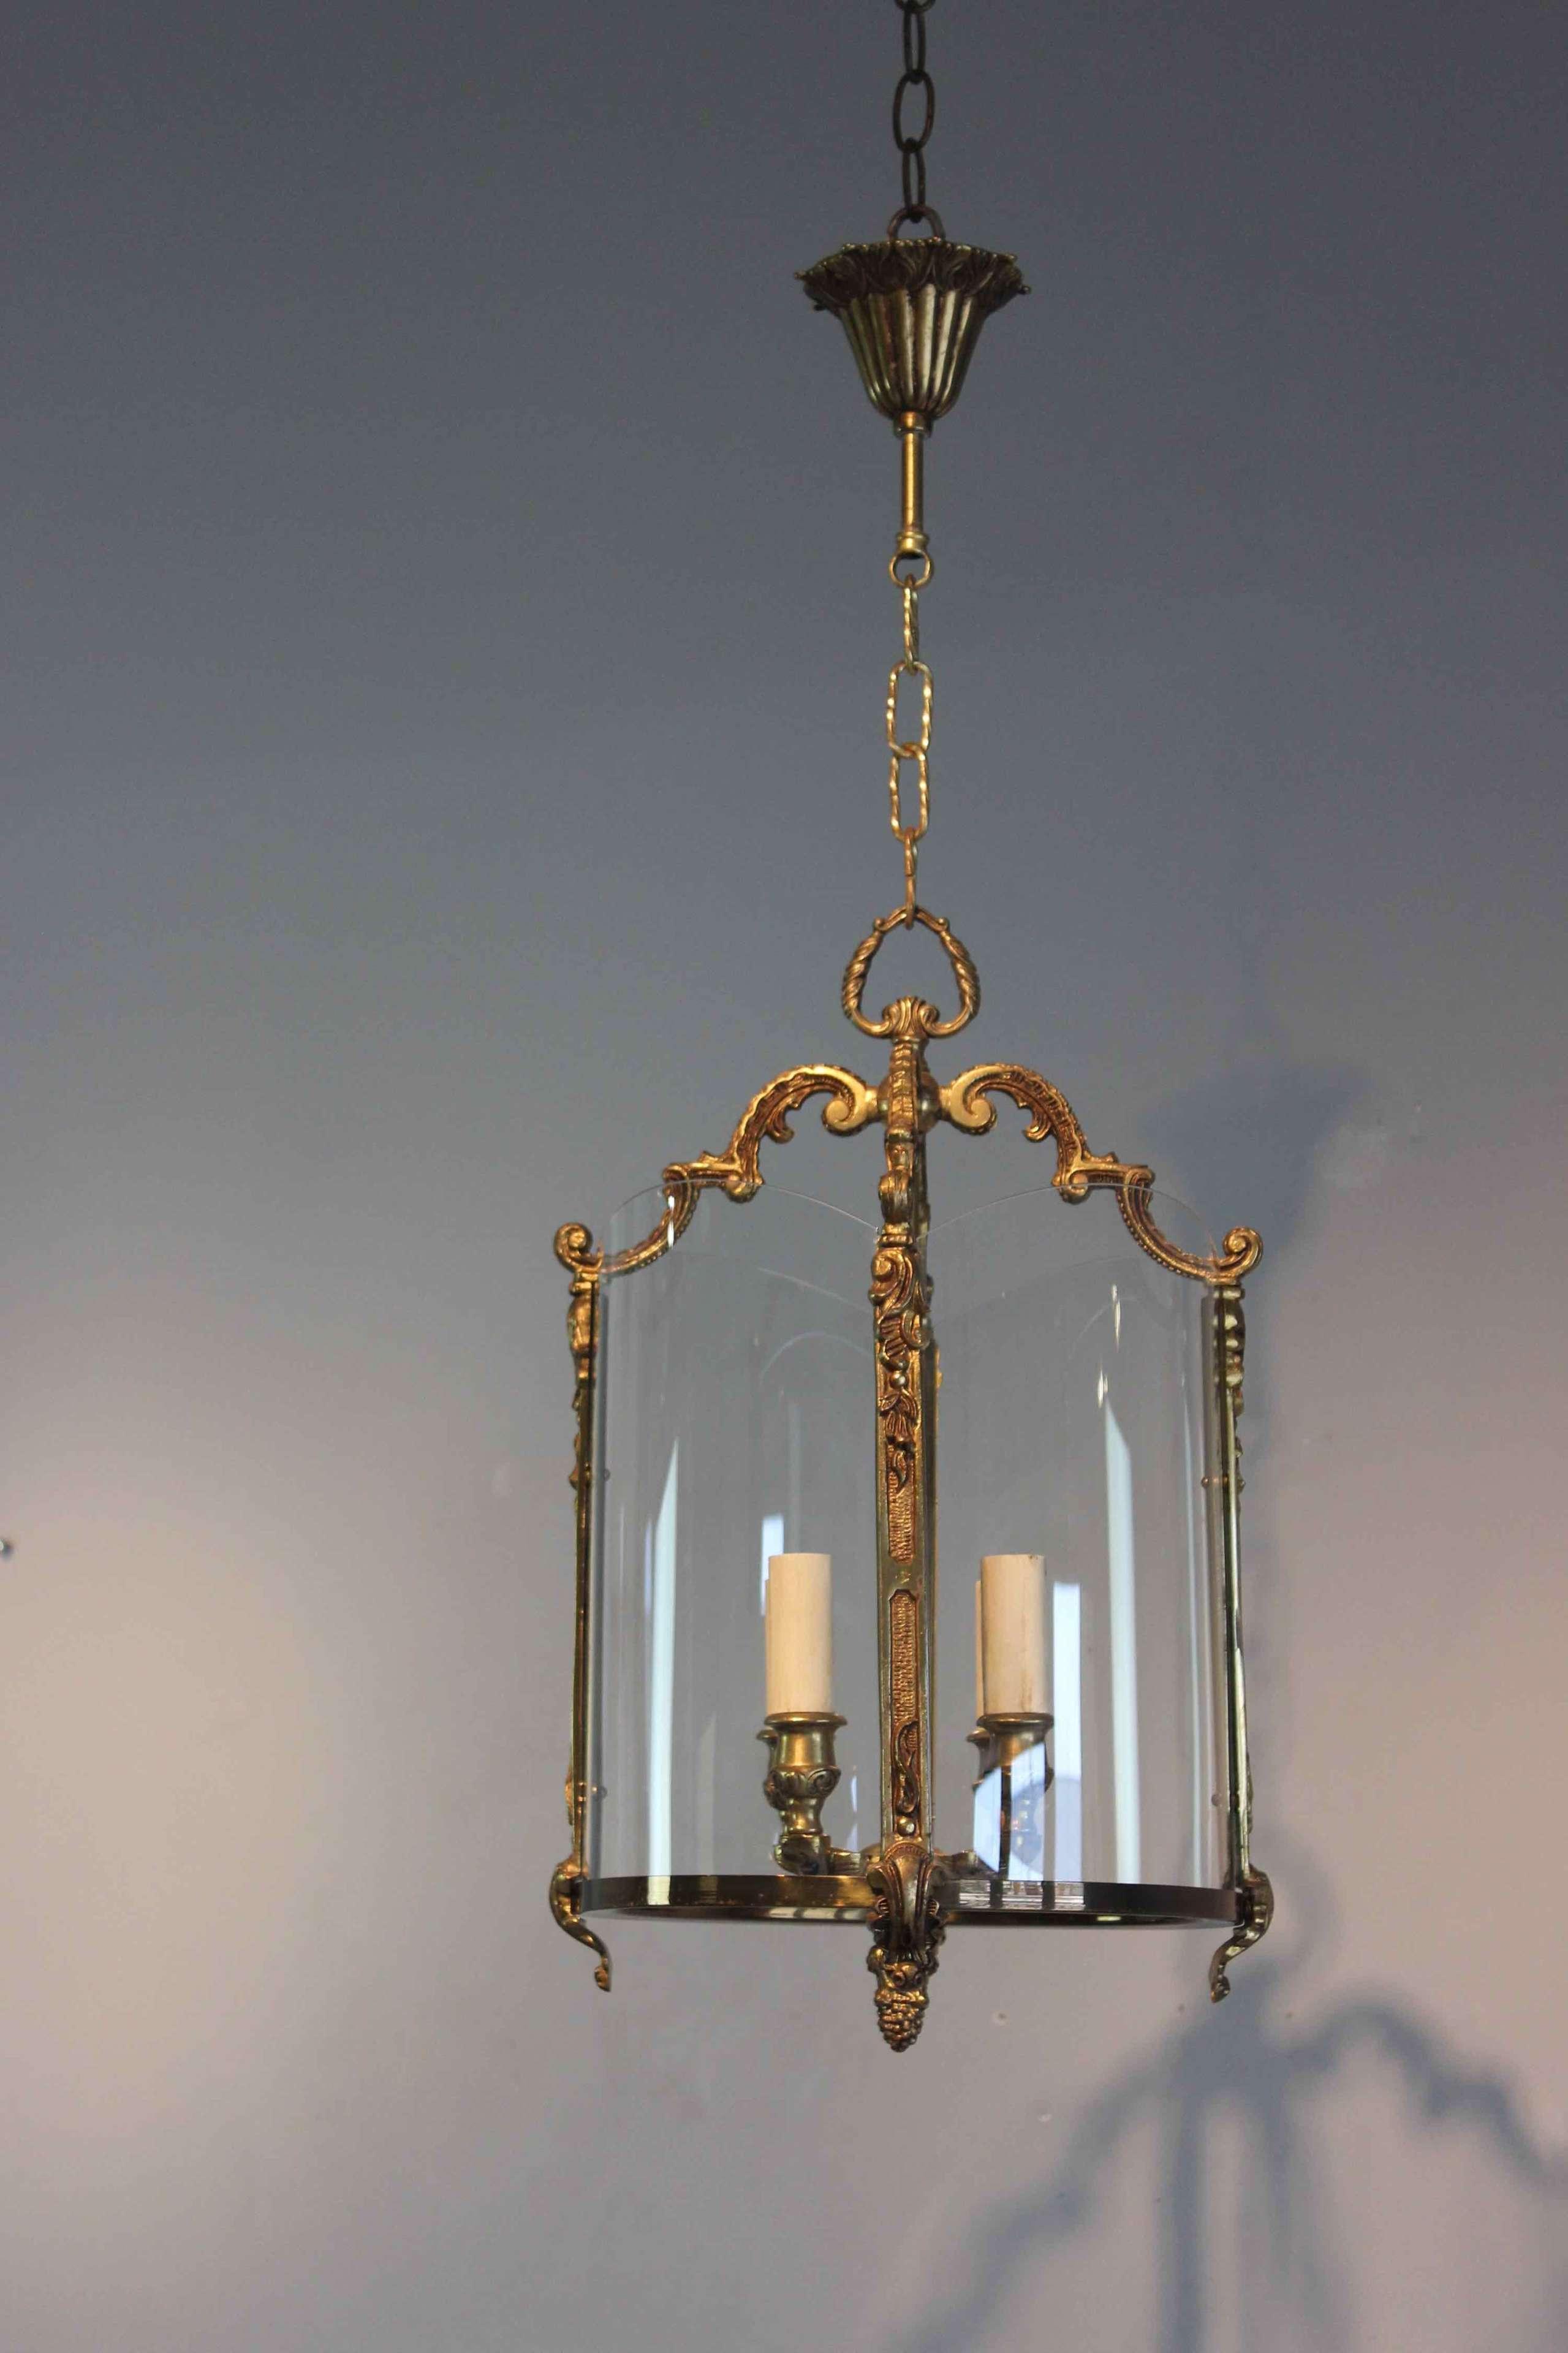 Circular glass French hall lantern